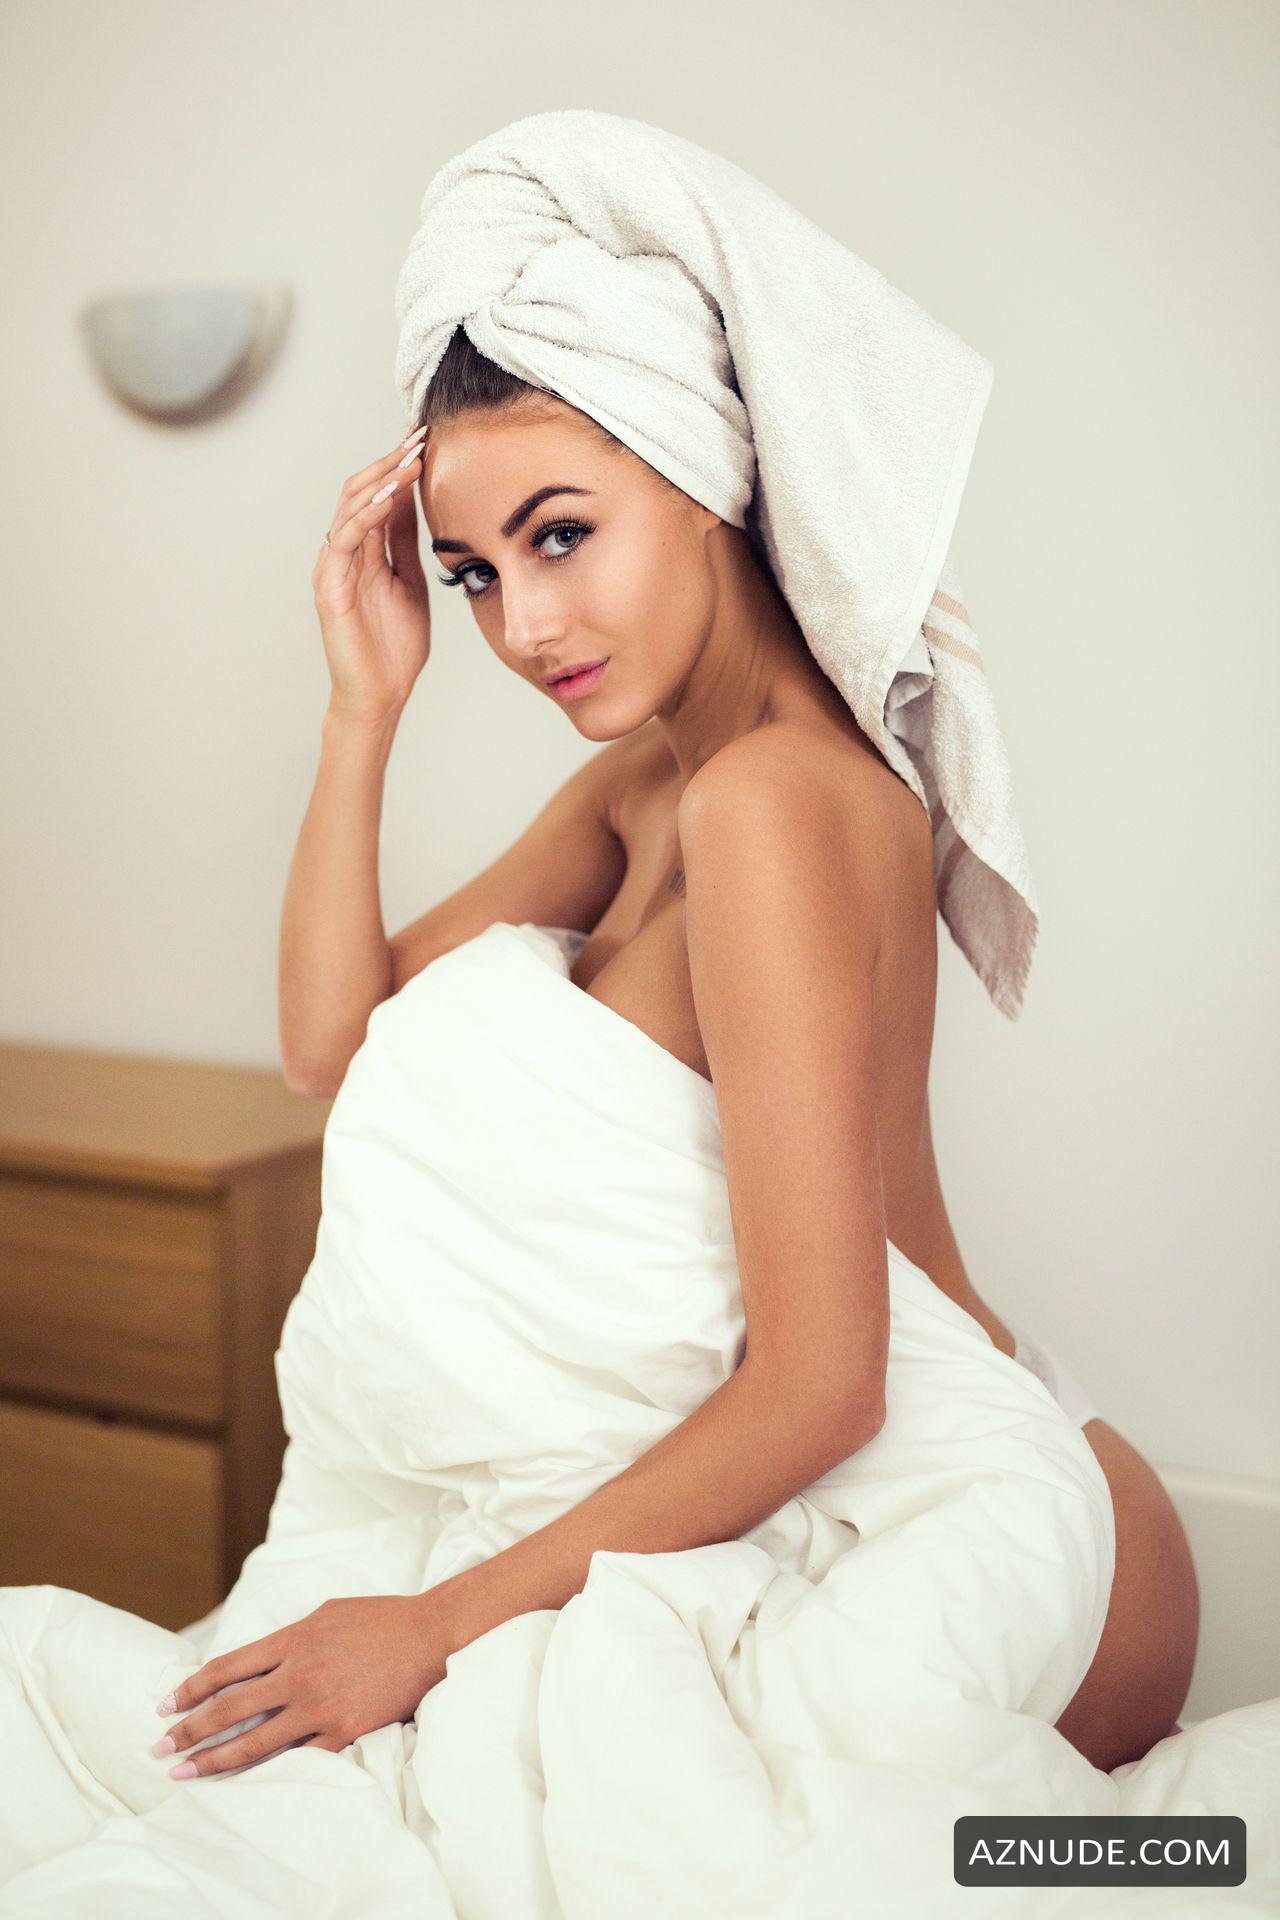 Chloe Veitch Nude photo 7